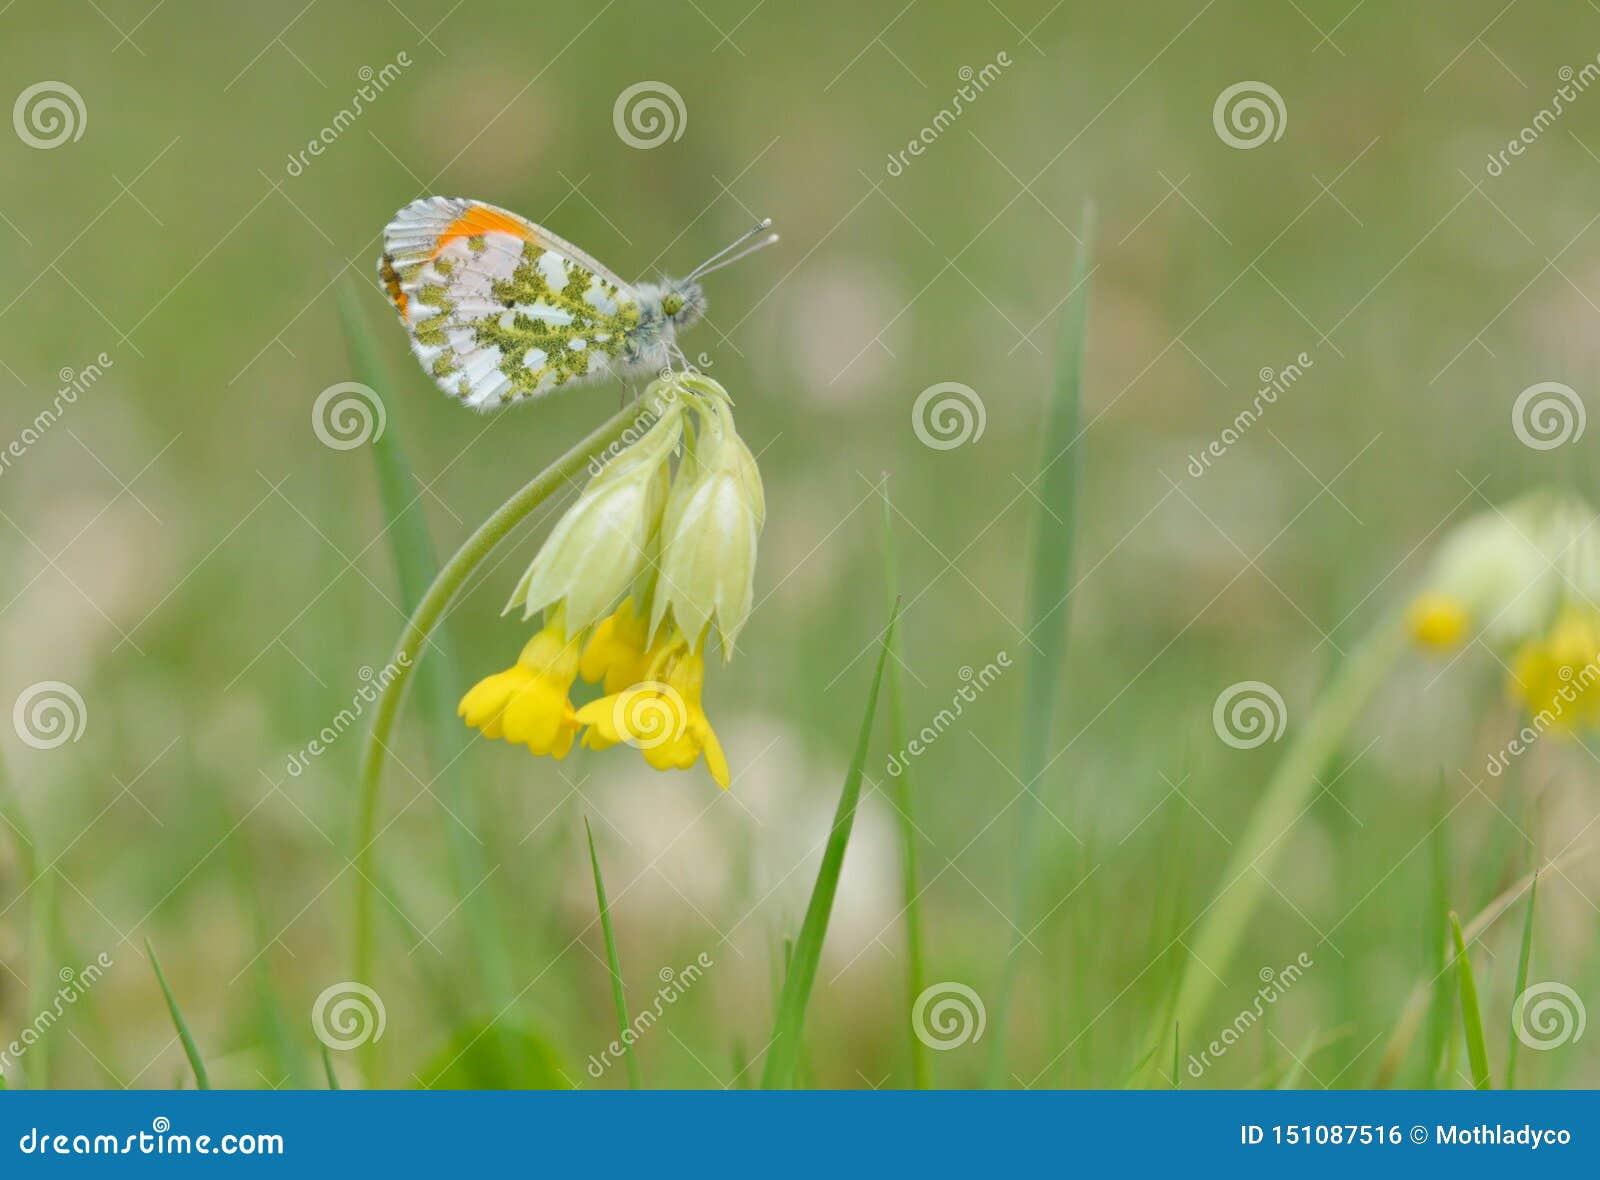 Anthocharis cardamines and Primula